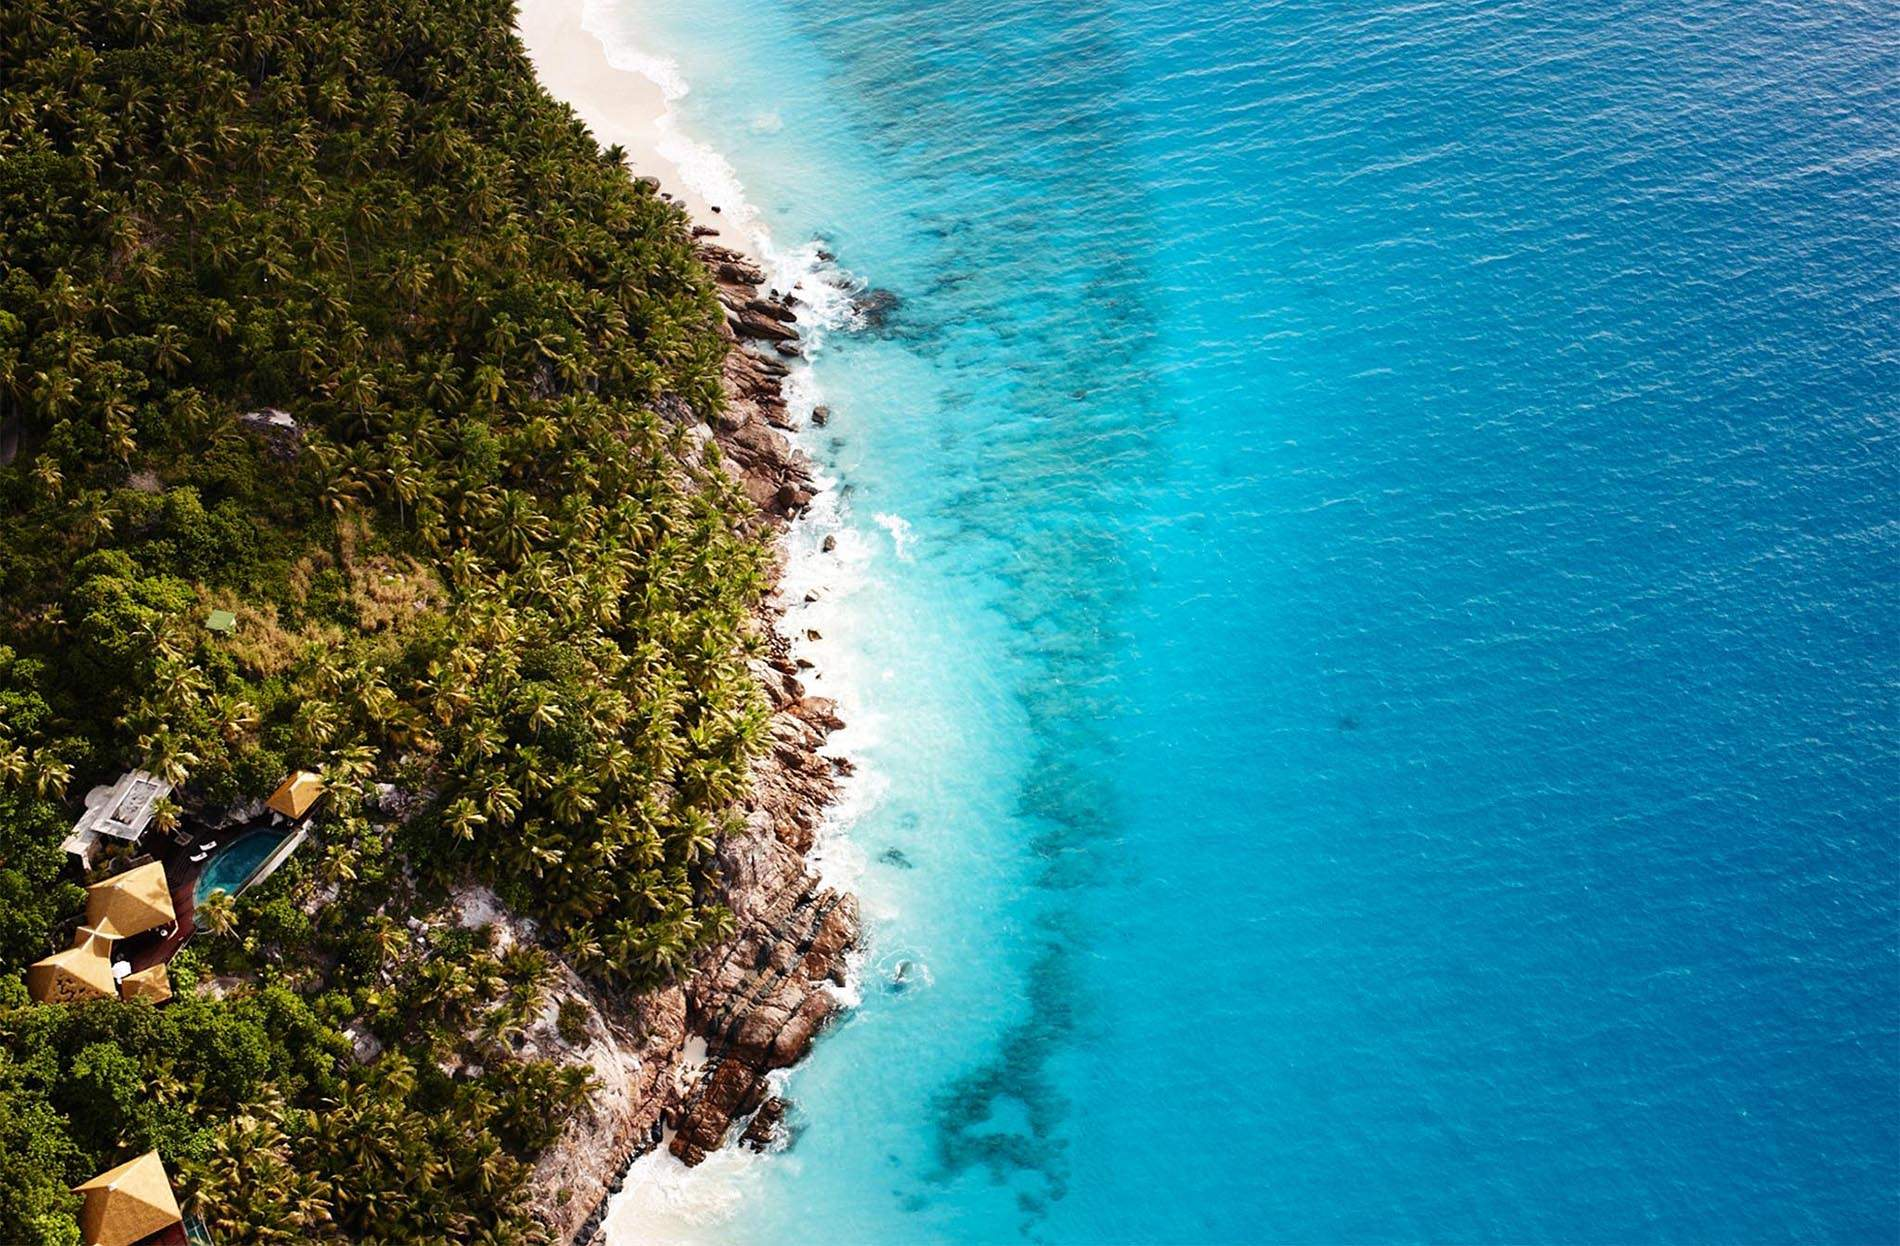 fregate island villa spa-villa 2 . Ciento quince islas...